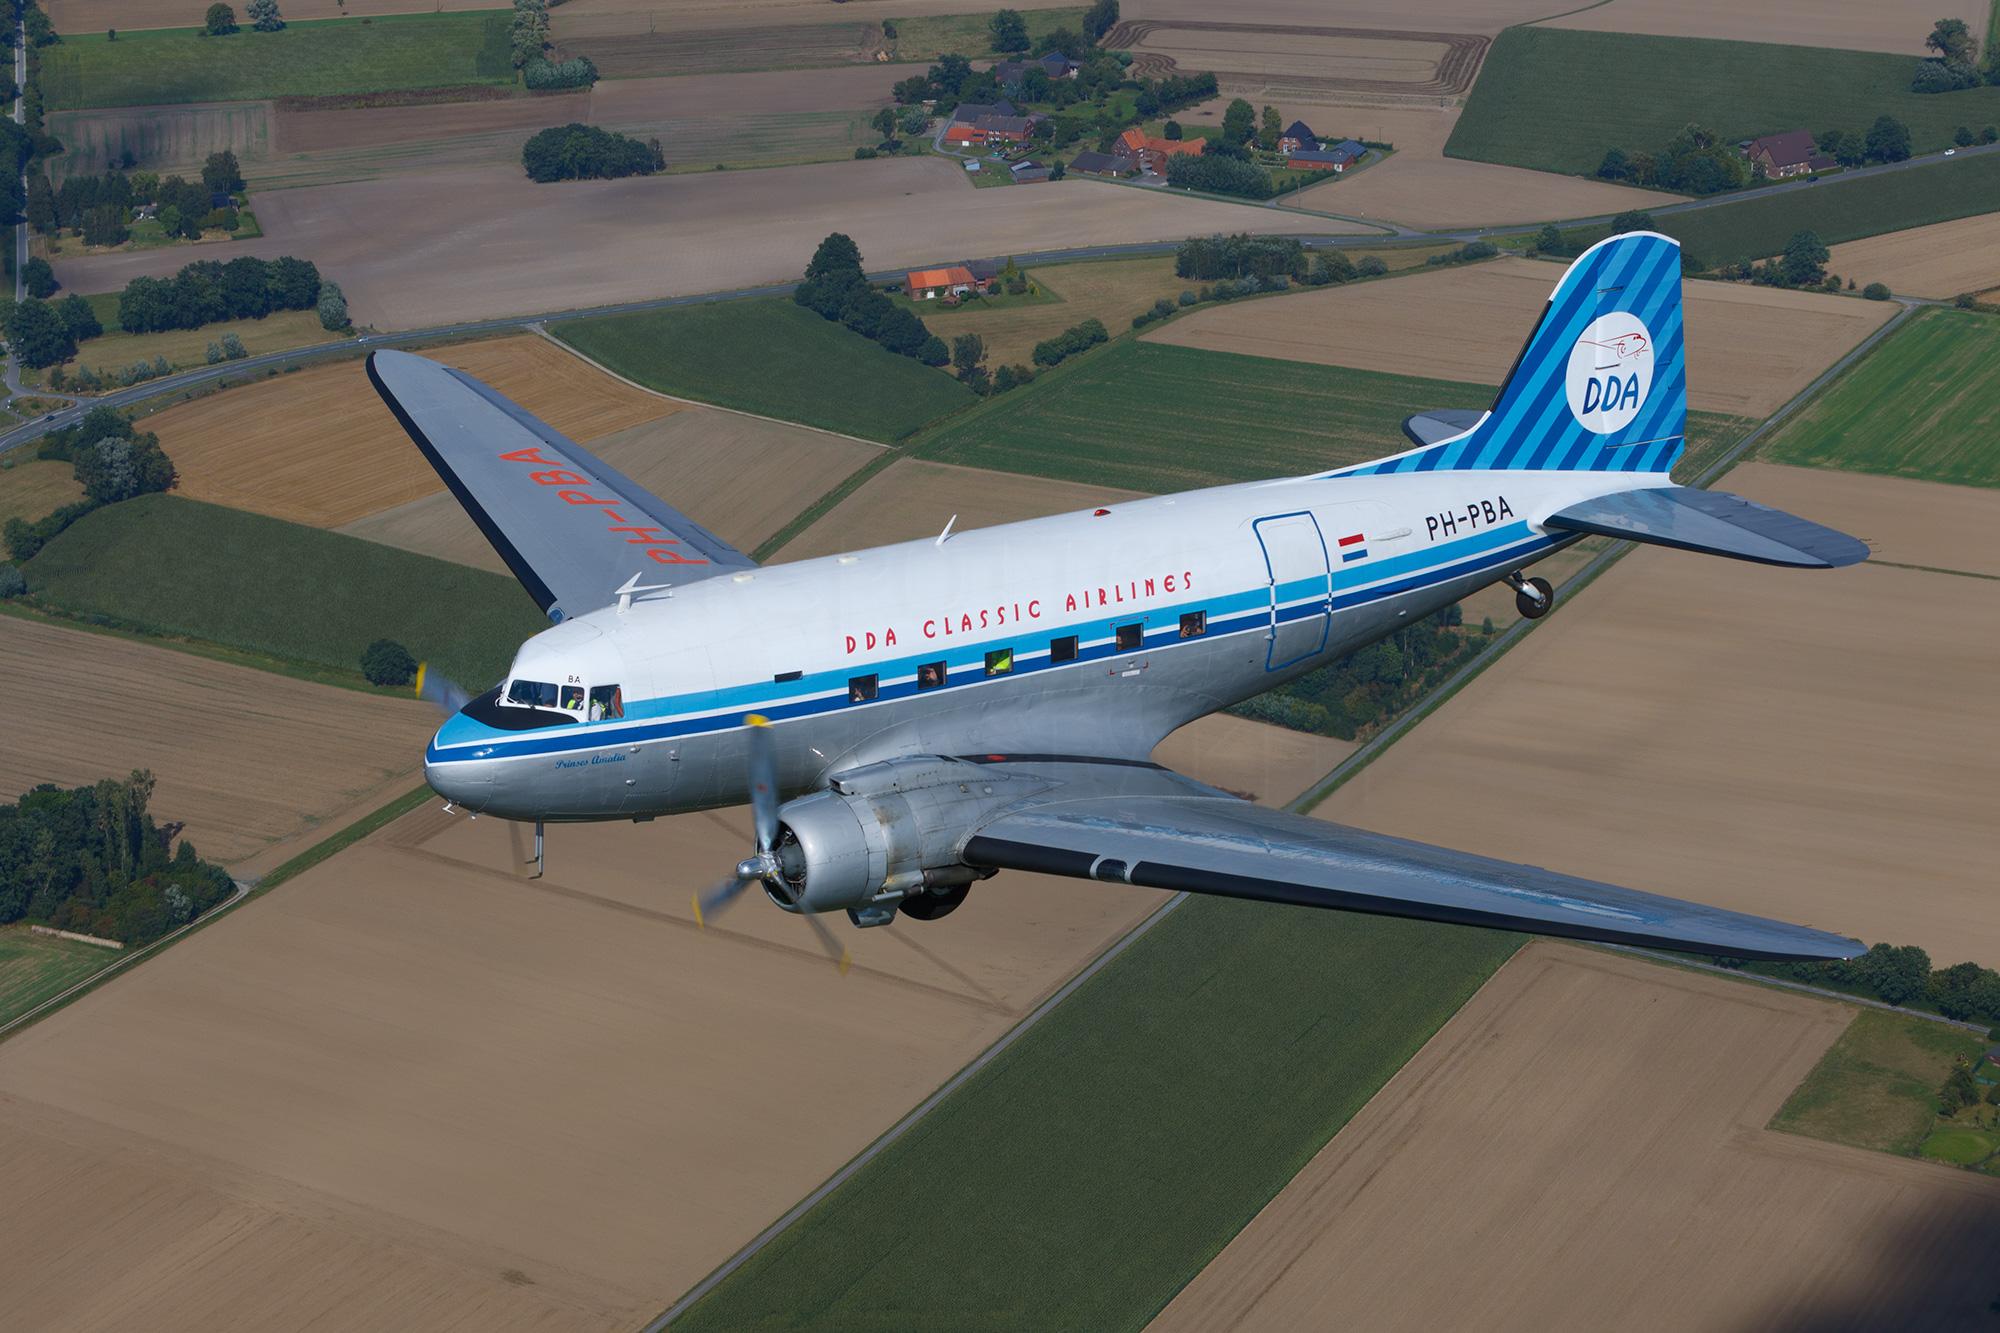 Airspotter.de 2016 DDA Classic Airlines DC-3-Dakota